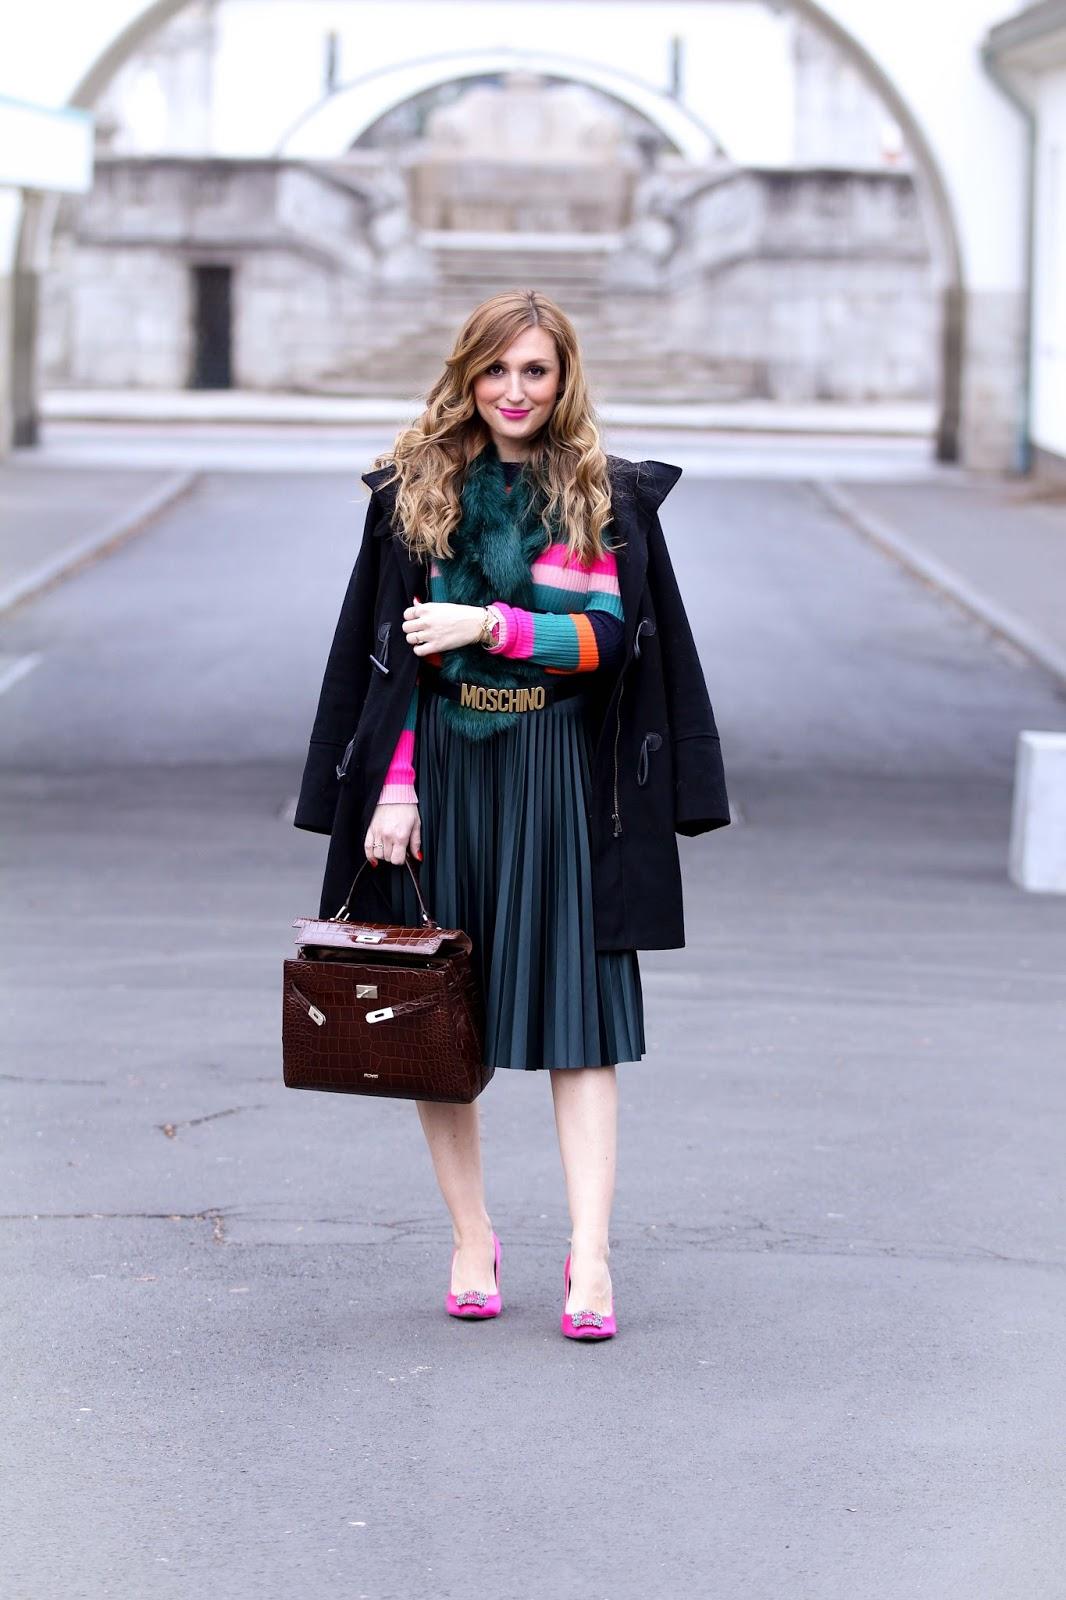 Fashionstylebyjohanna-Fashionblogger-aus-deutschland-Lifestyleblogger-Gerry-Weber-Winterjacke-Lookbookstore-Jacke-kombinieren-wie-kann-man-Jeans-schuhe-kombinieren-grüne-Jack